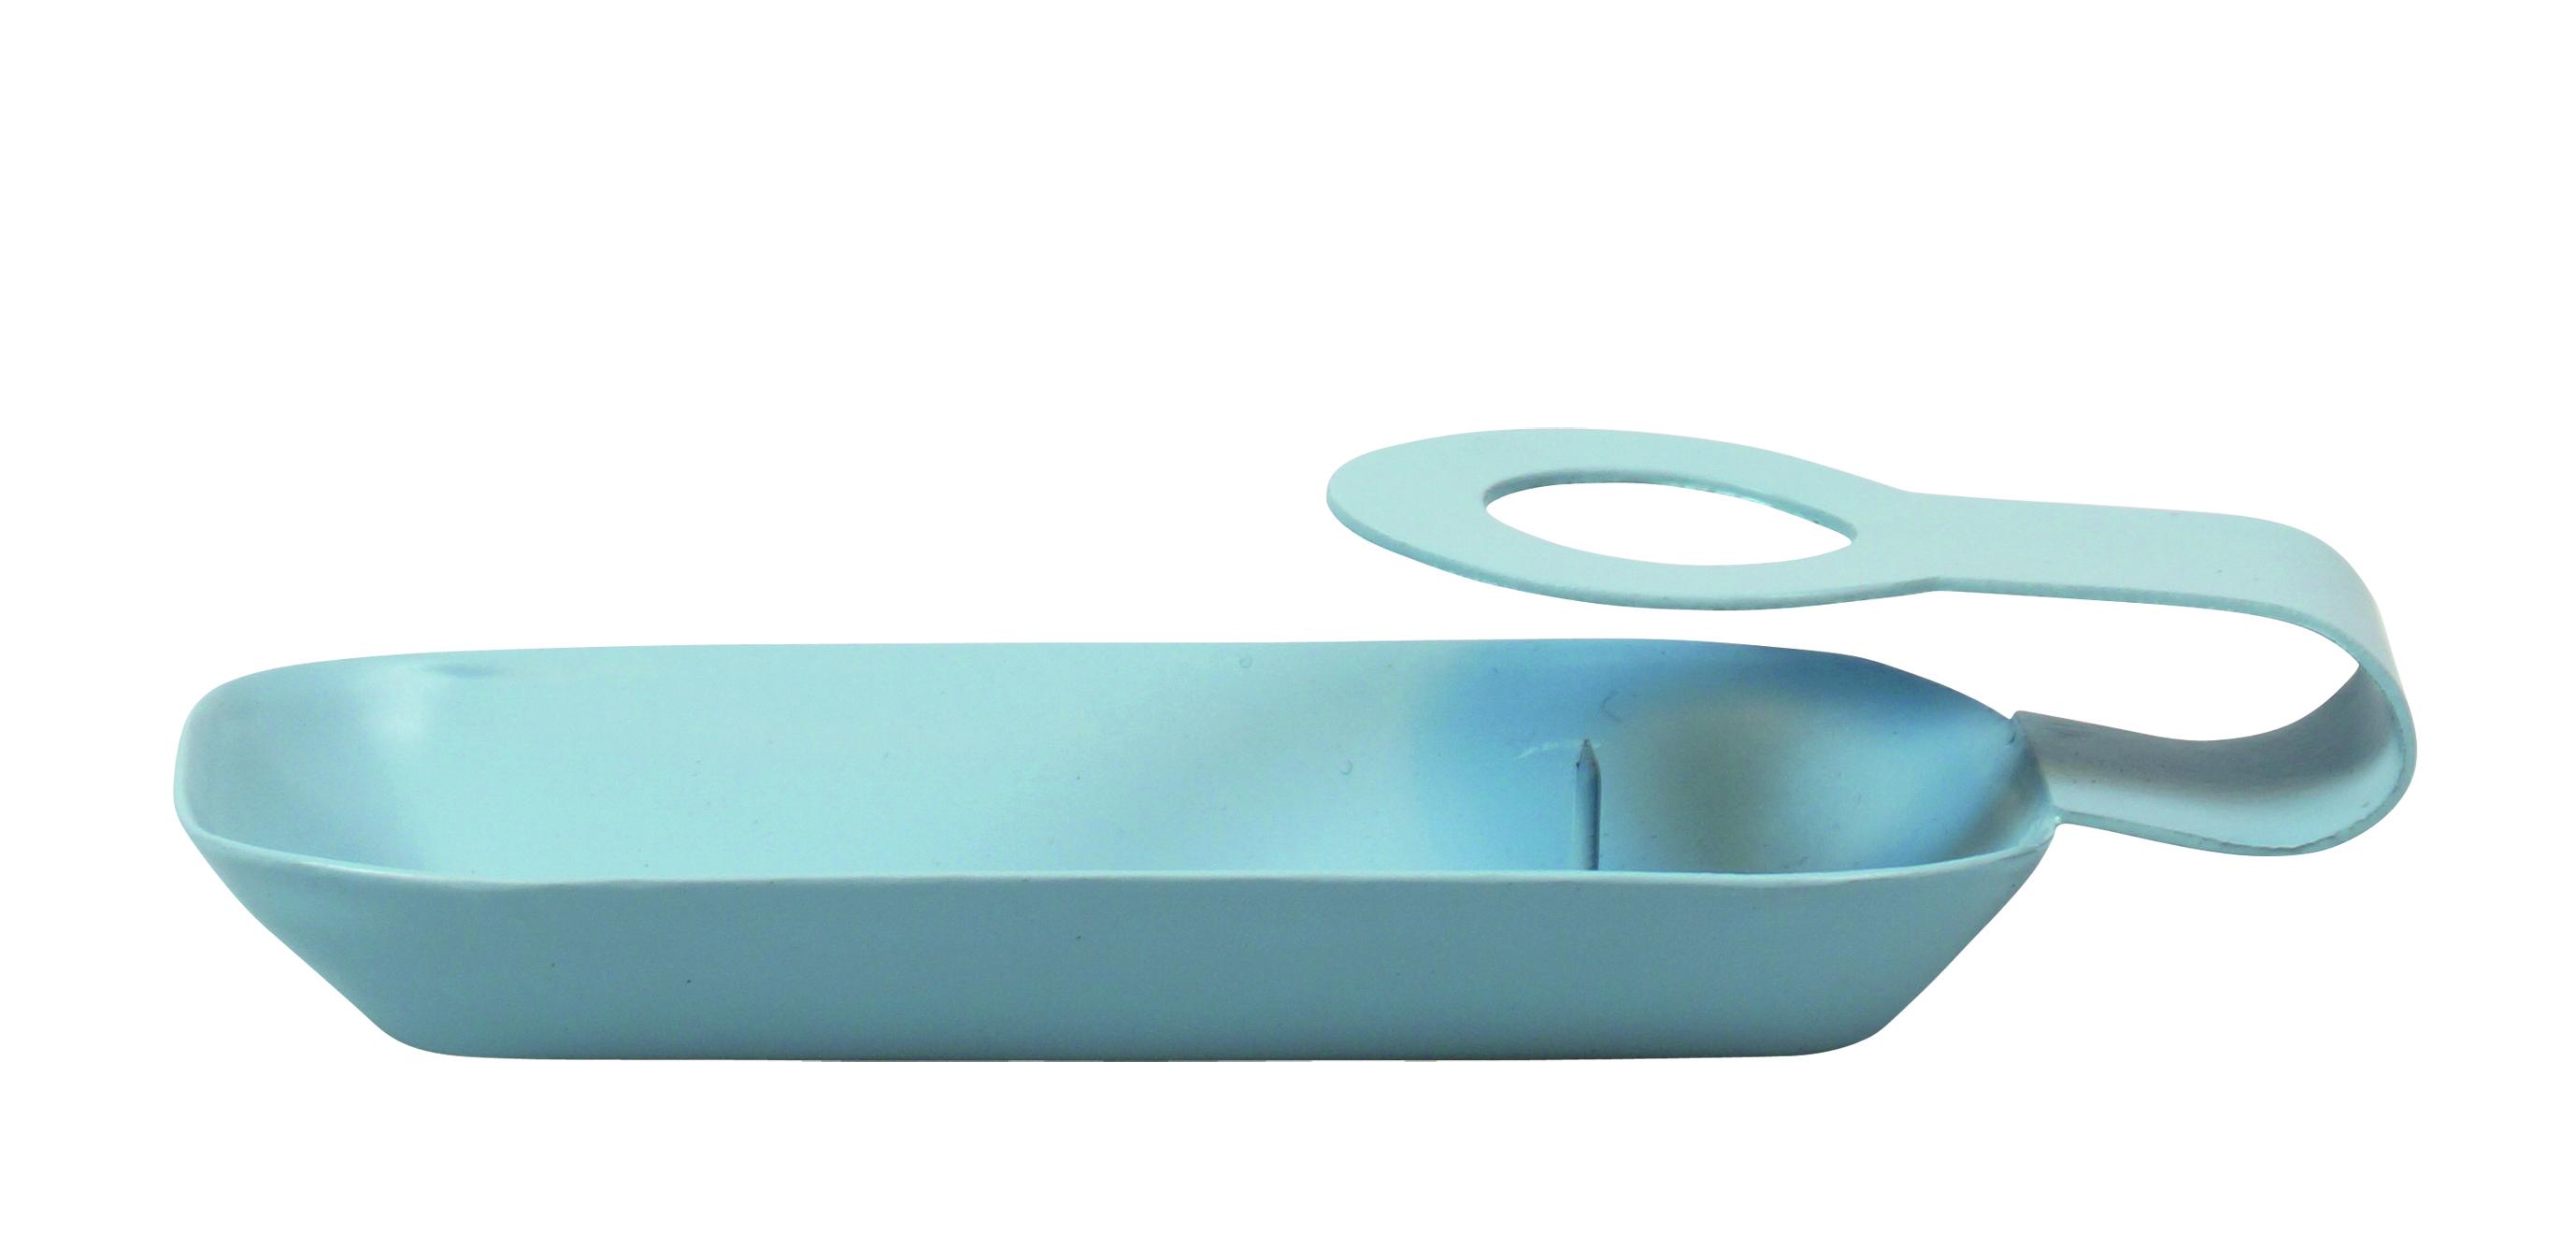 Kynttilänjalka - sininen